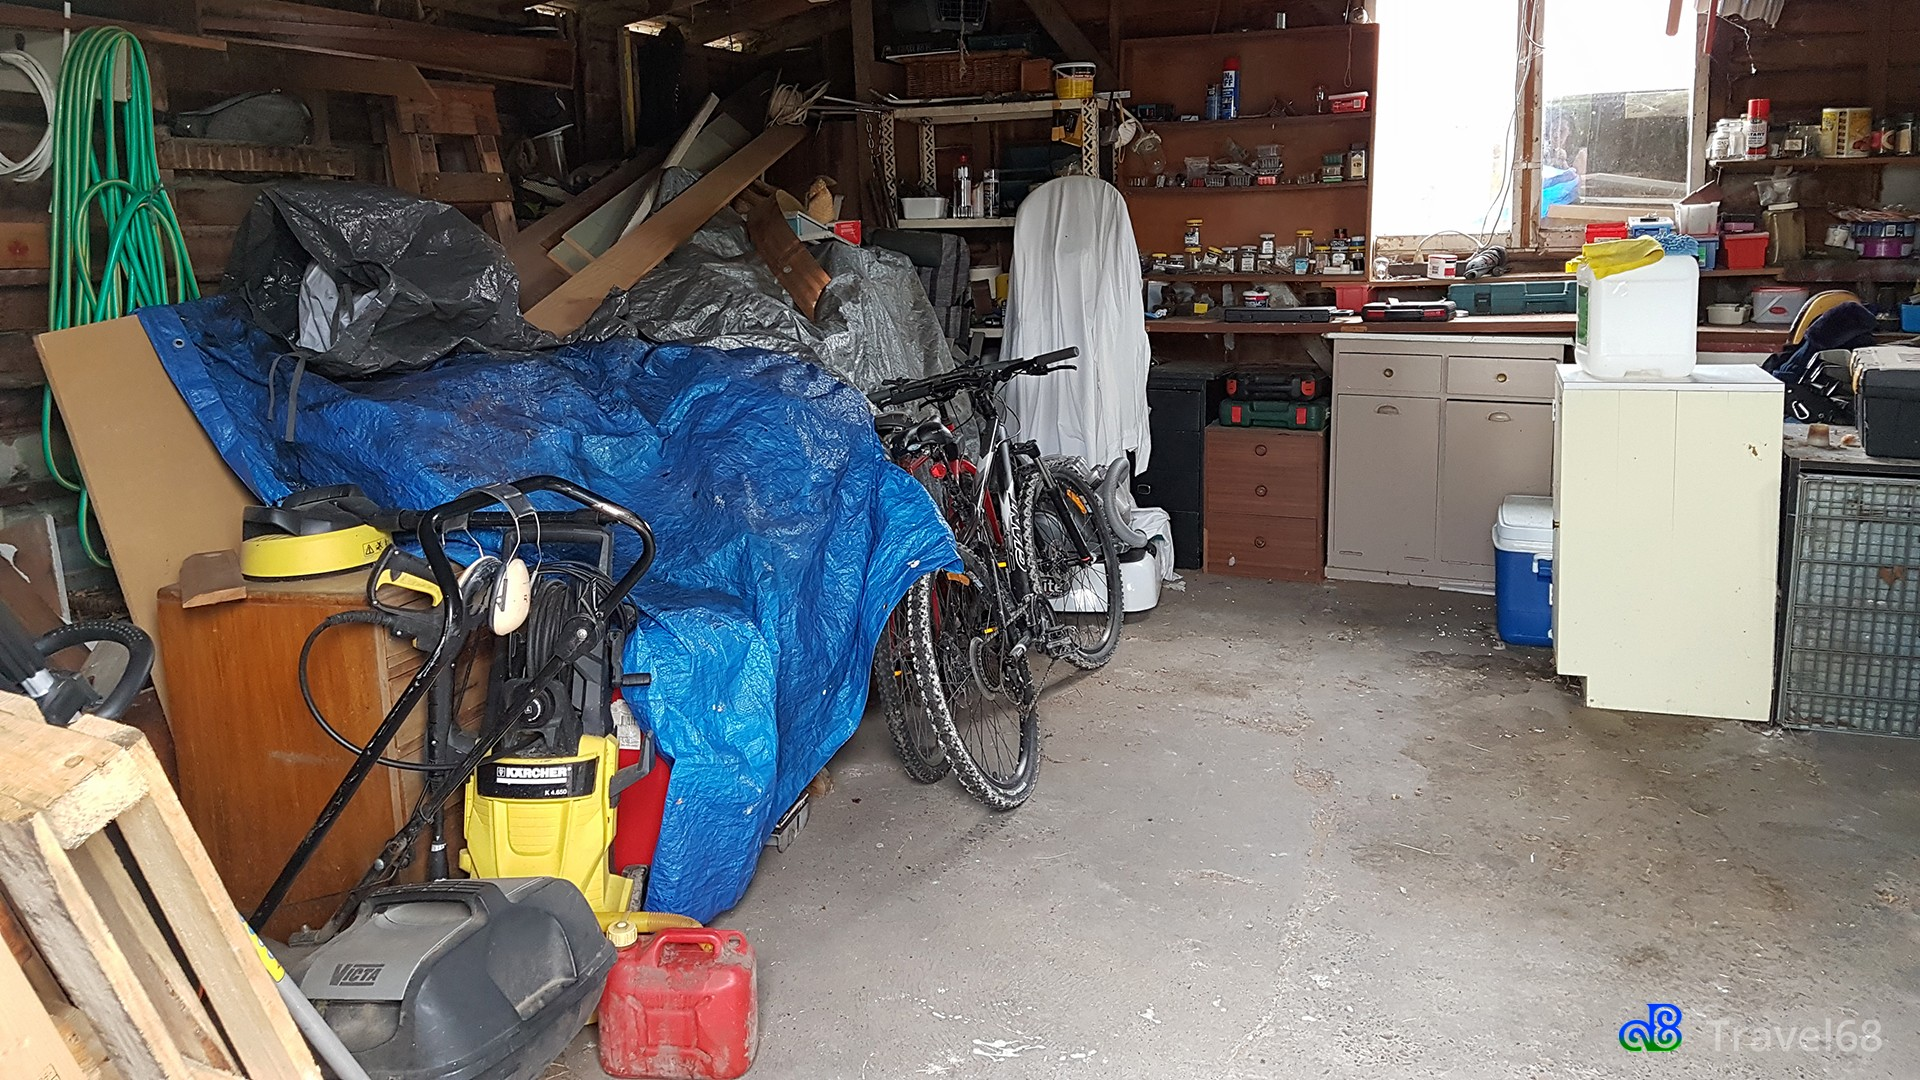 Zo zag de garage eruit